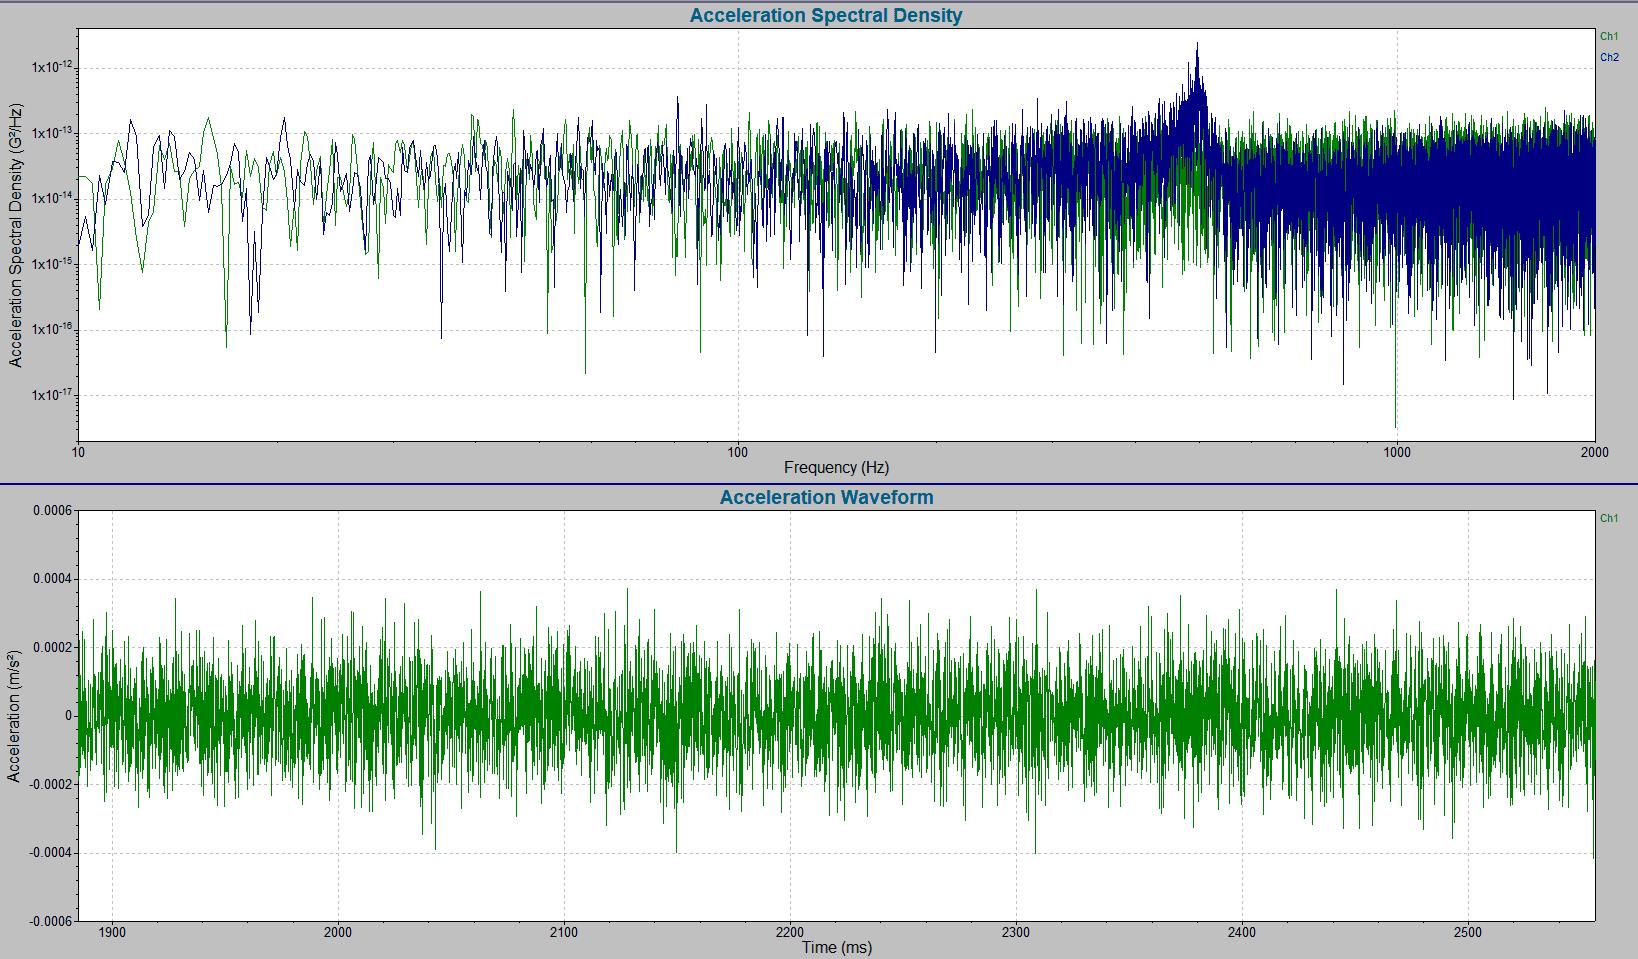 power spectral density graph acceleration waveform